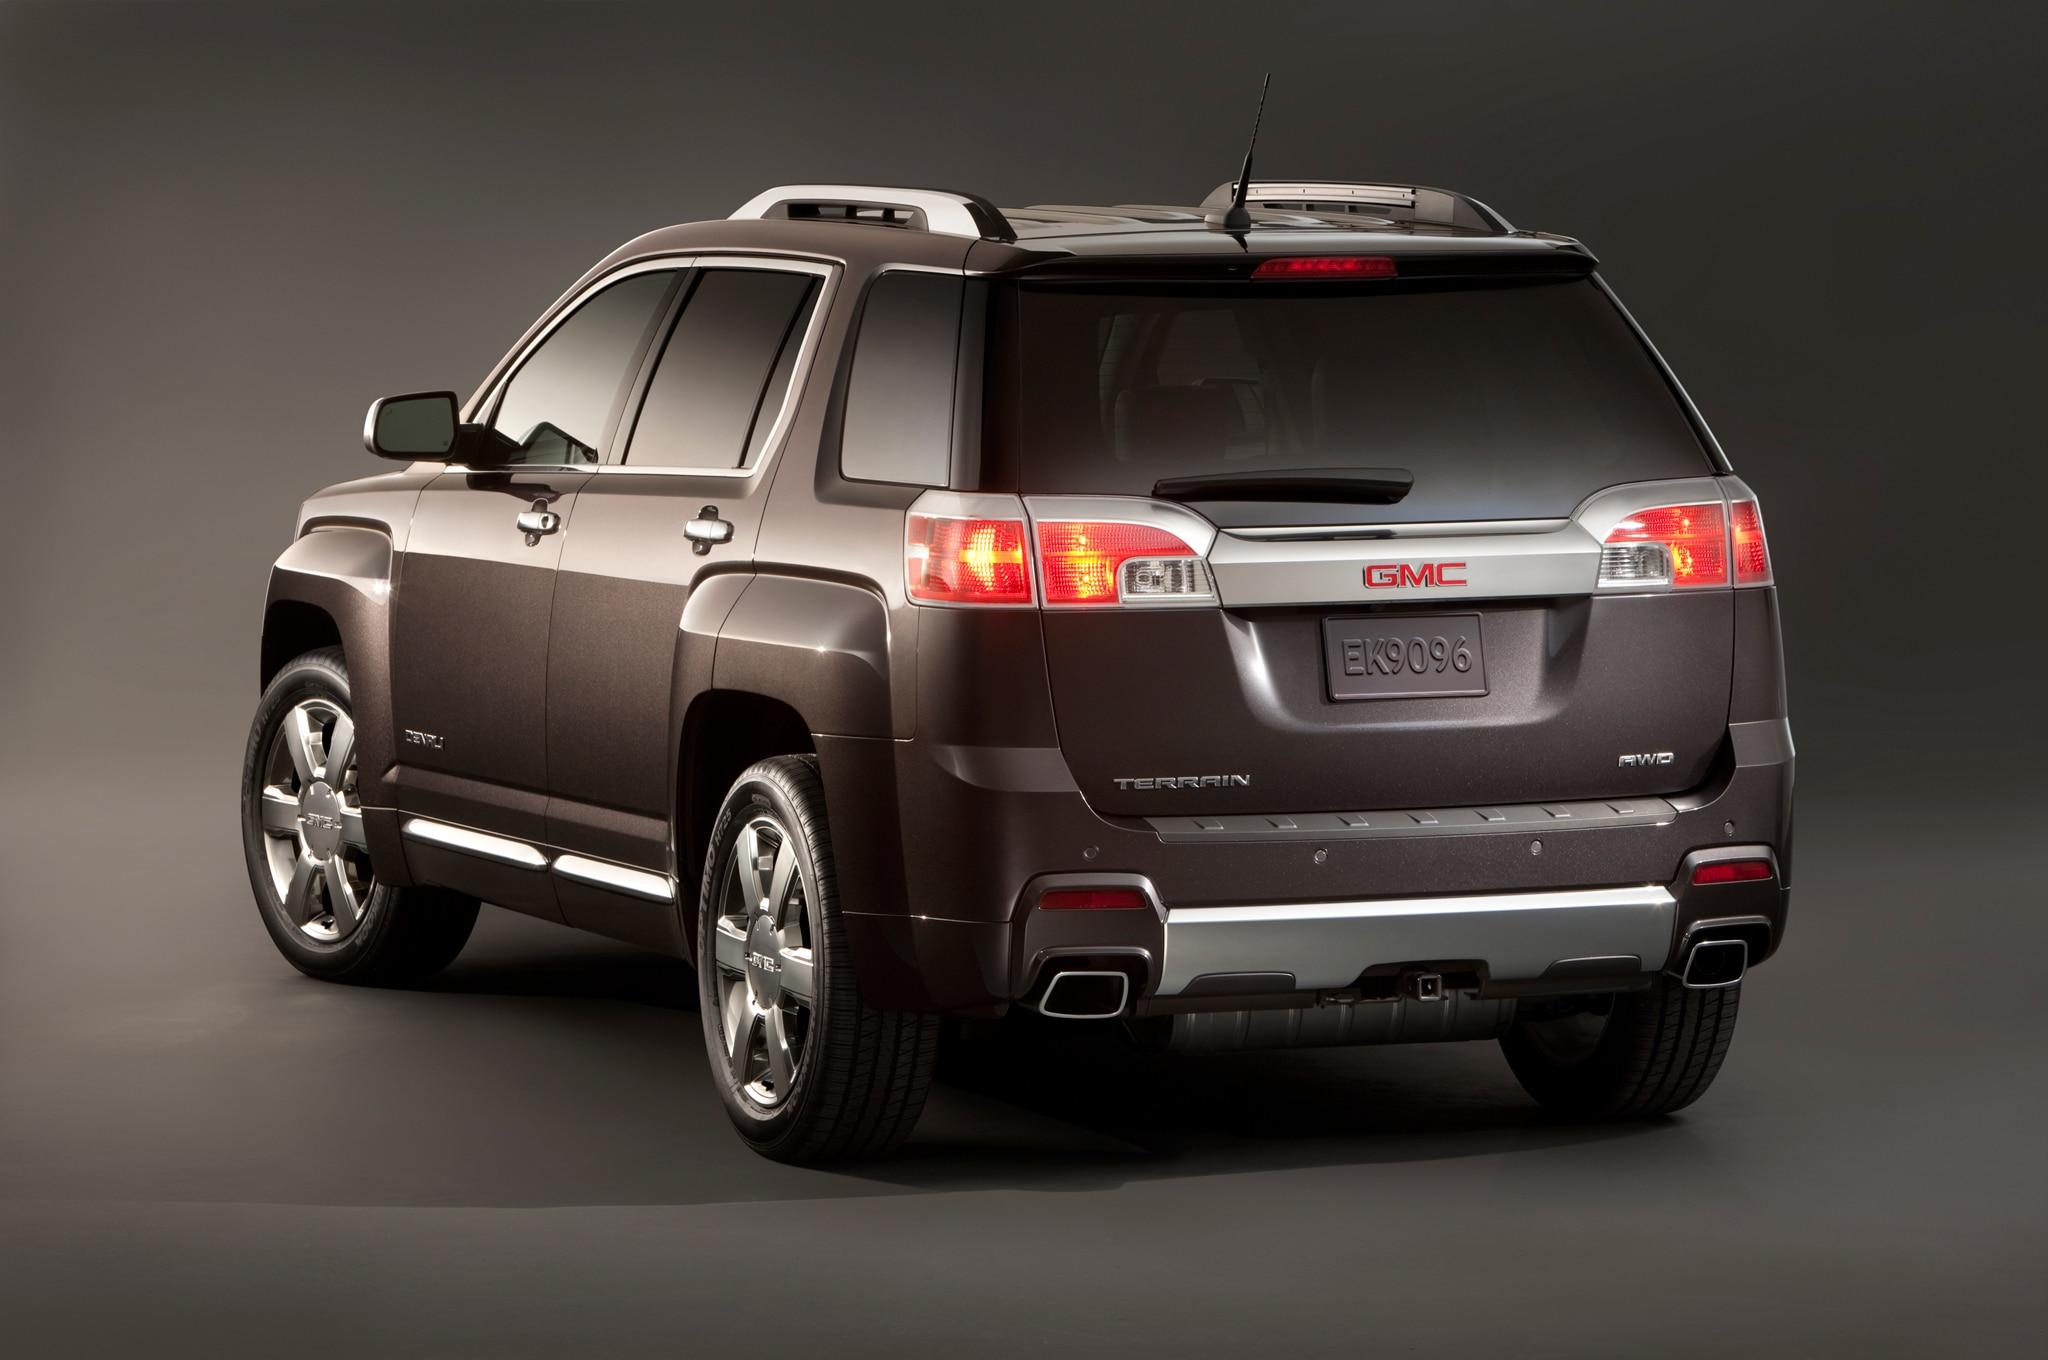 Chevy Traverse Mpg >> 2018 Chevrolet Traverse, GMC Terrain to Debut in Detroit: Report | Automobile Magazine